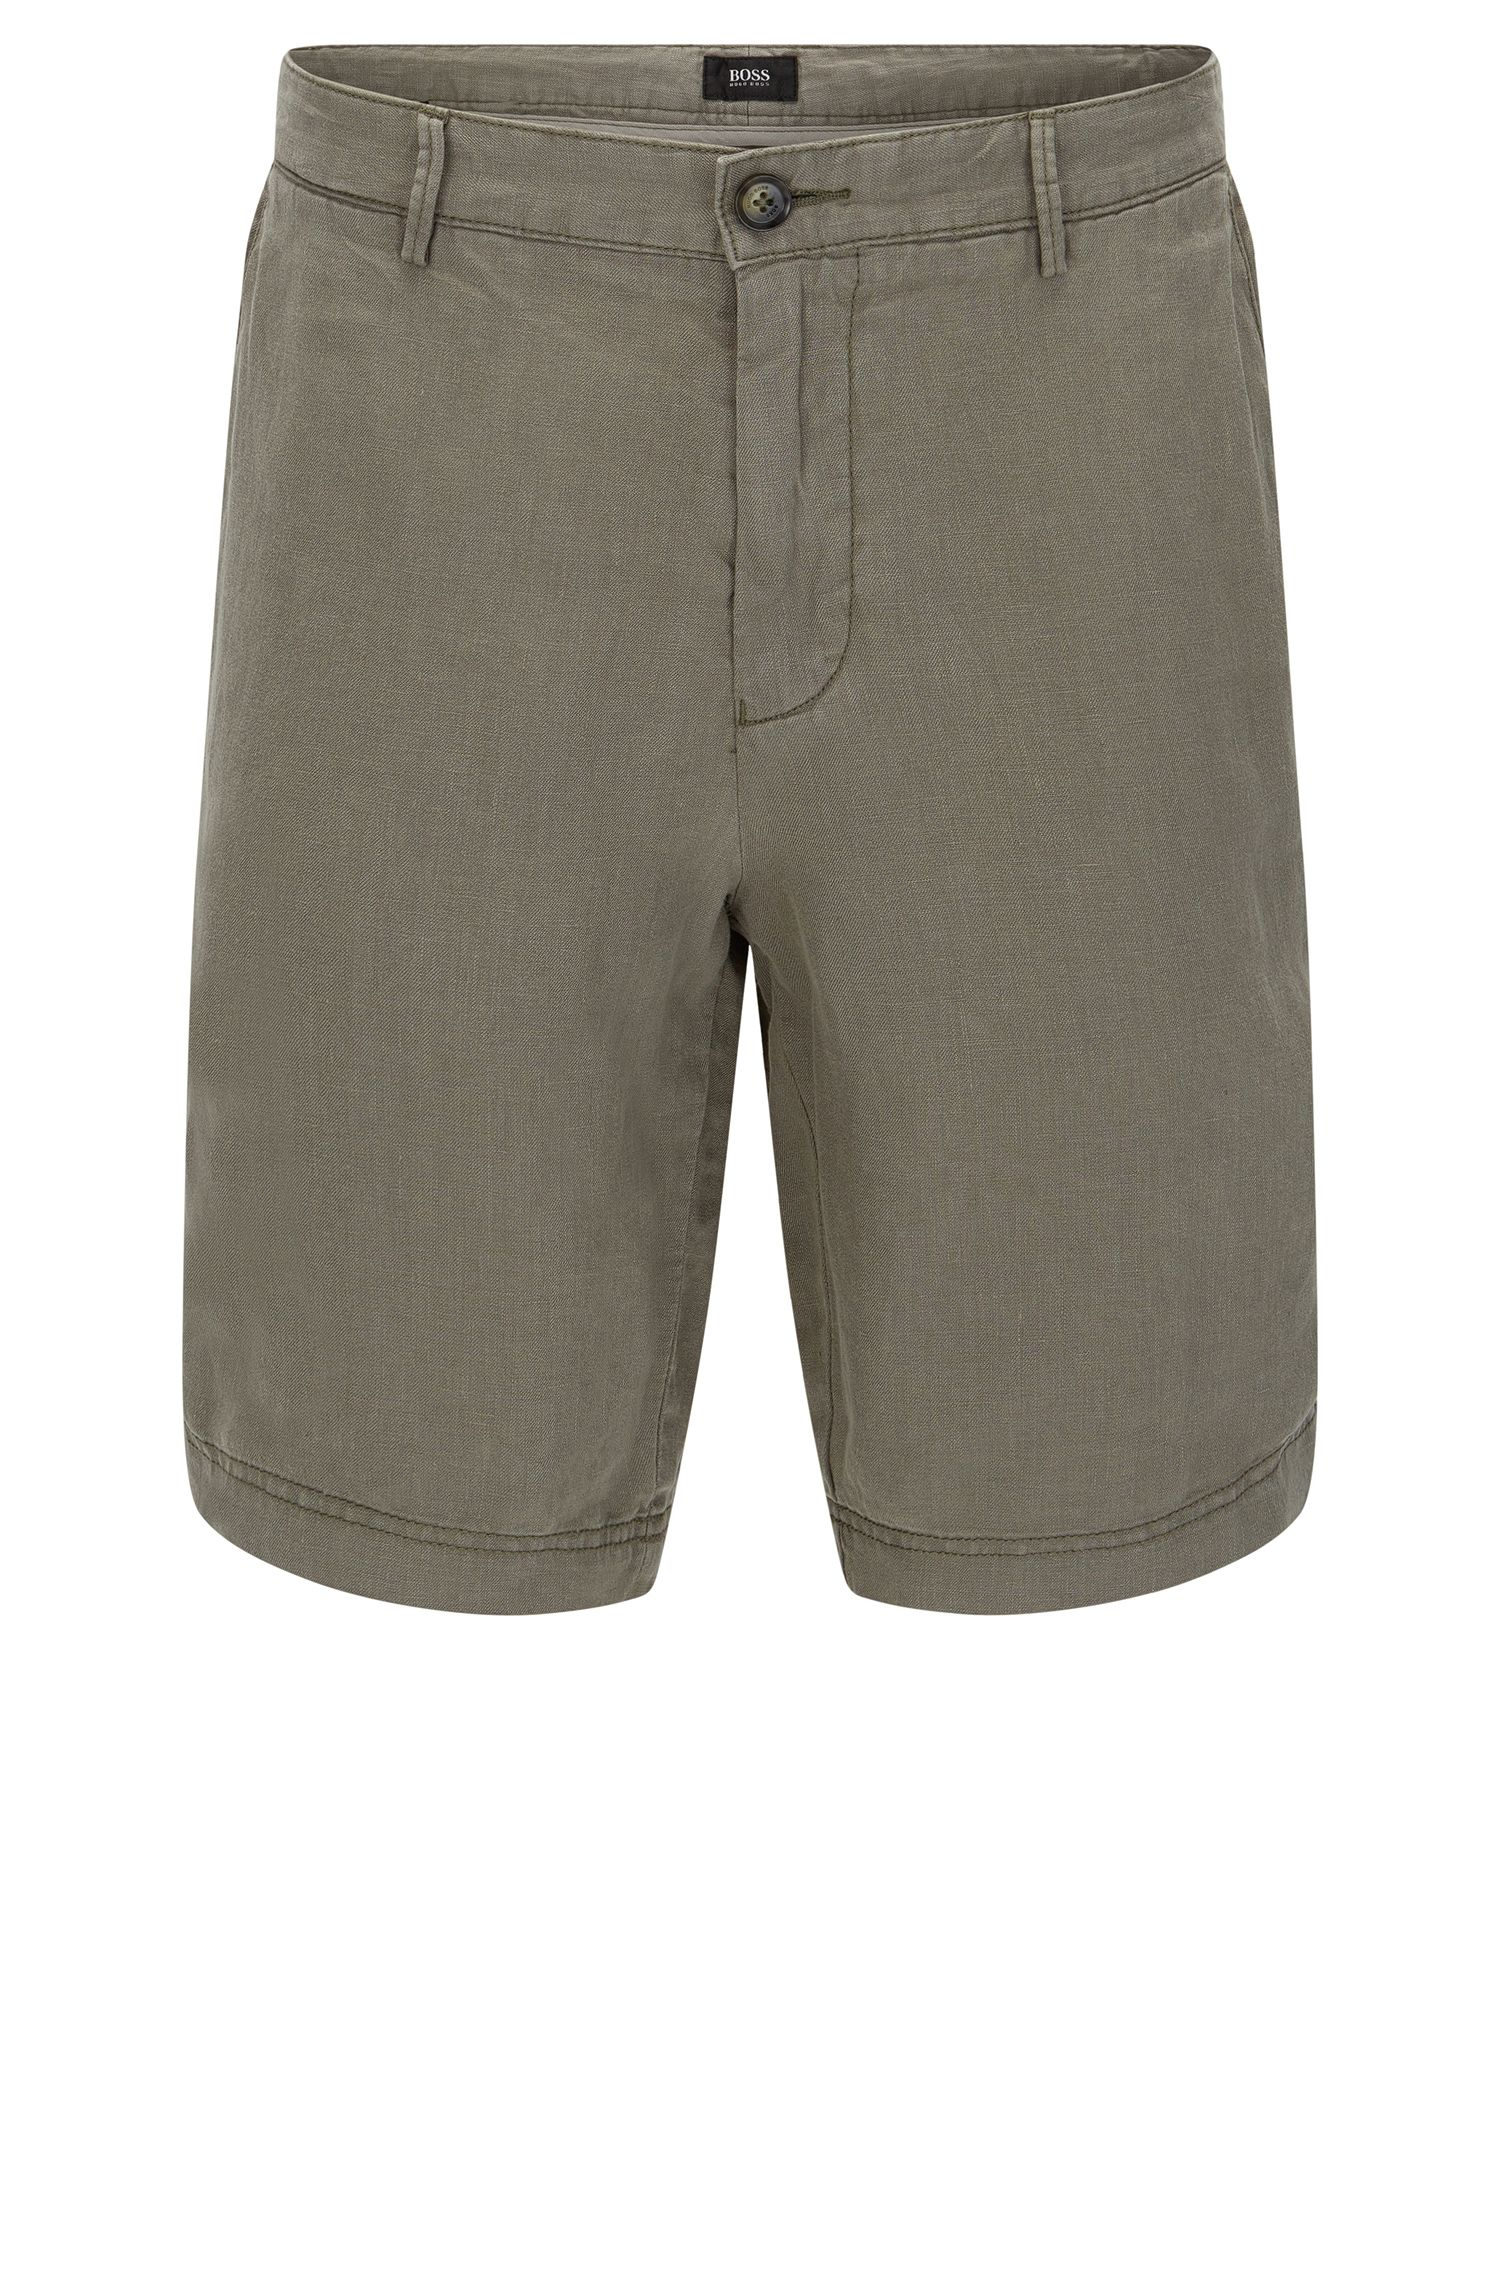 Regular Fit, Linen Short, Regular Fit   Crigan Short D